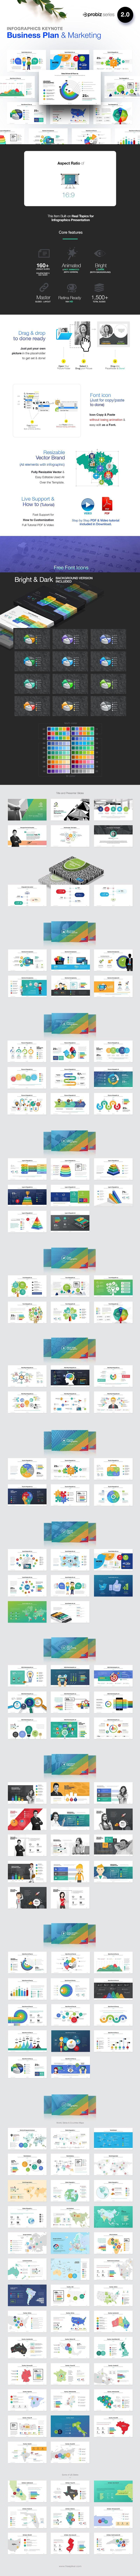 Infographics KeyNote | ProBiz 2.0